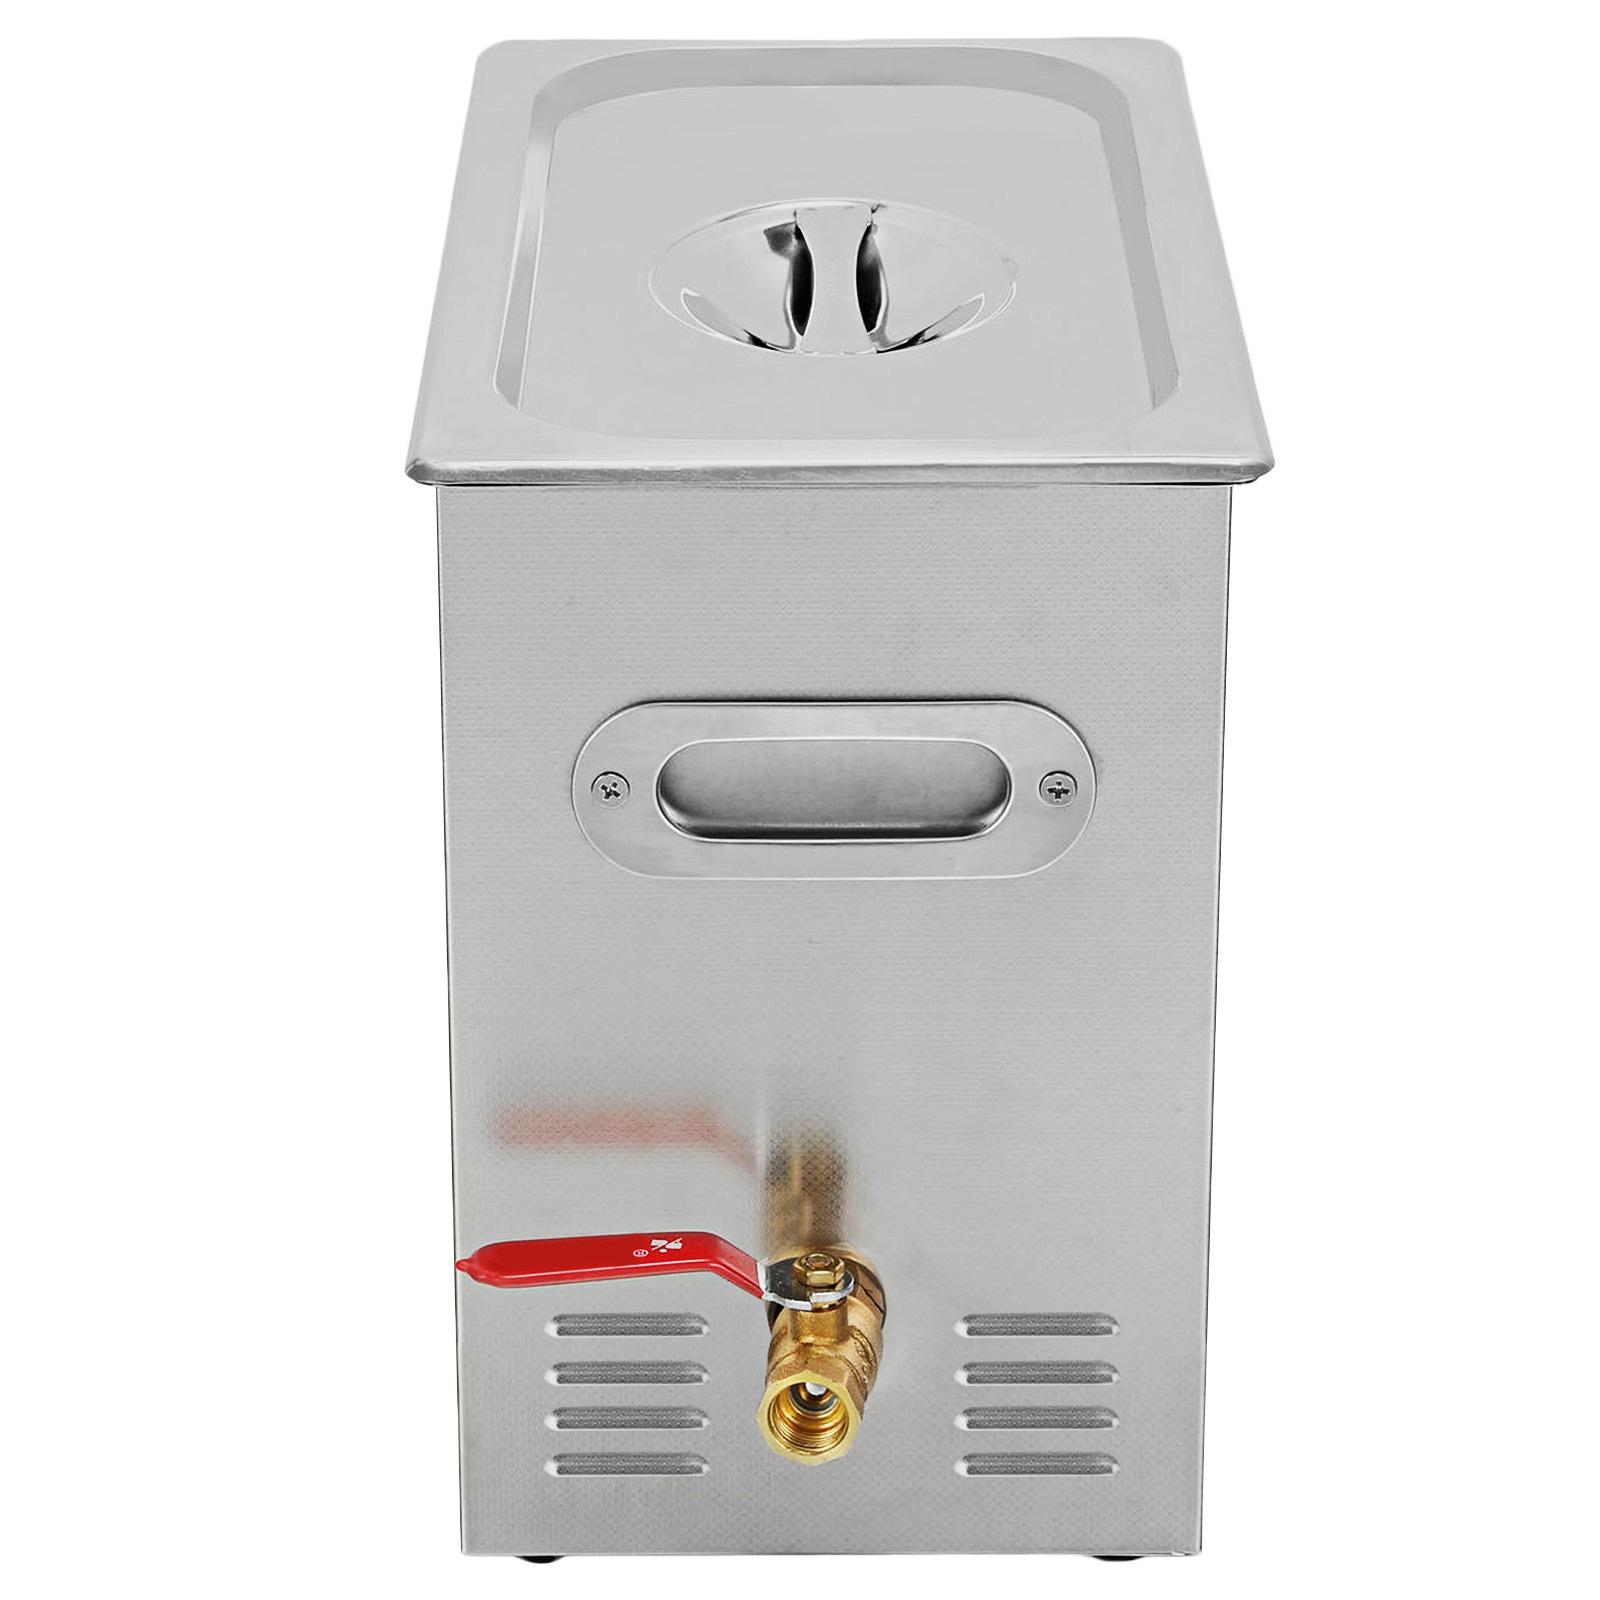 Vaschetta-Vasca-Ultrasuoni-Lavatrice-Pulitore-Ad-Ultrasuoni miniatura 63